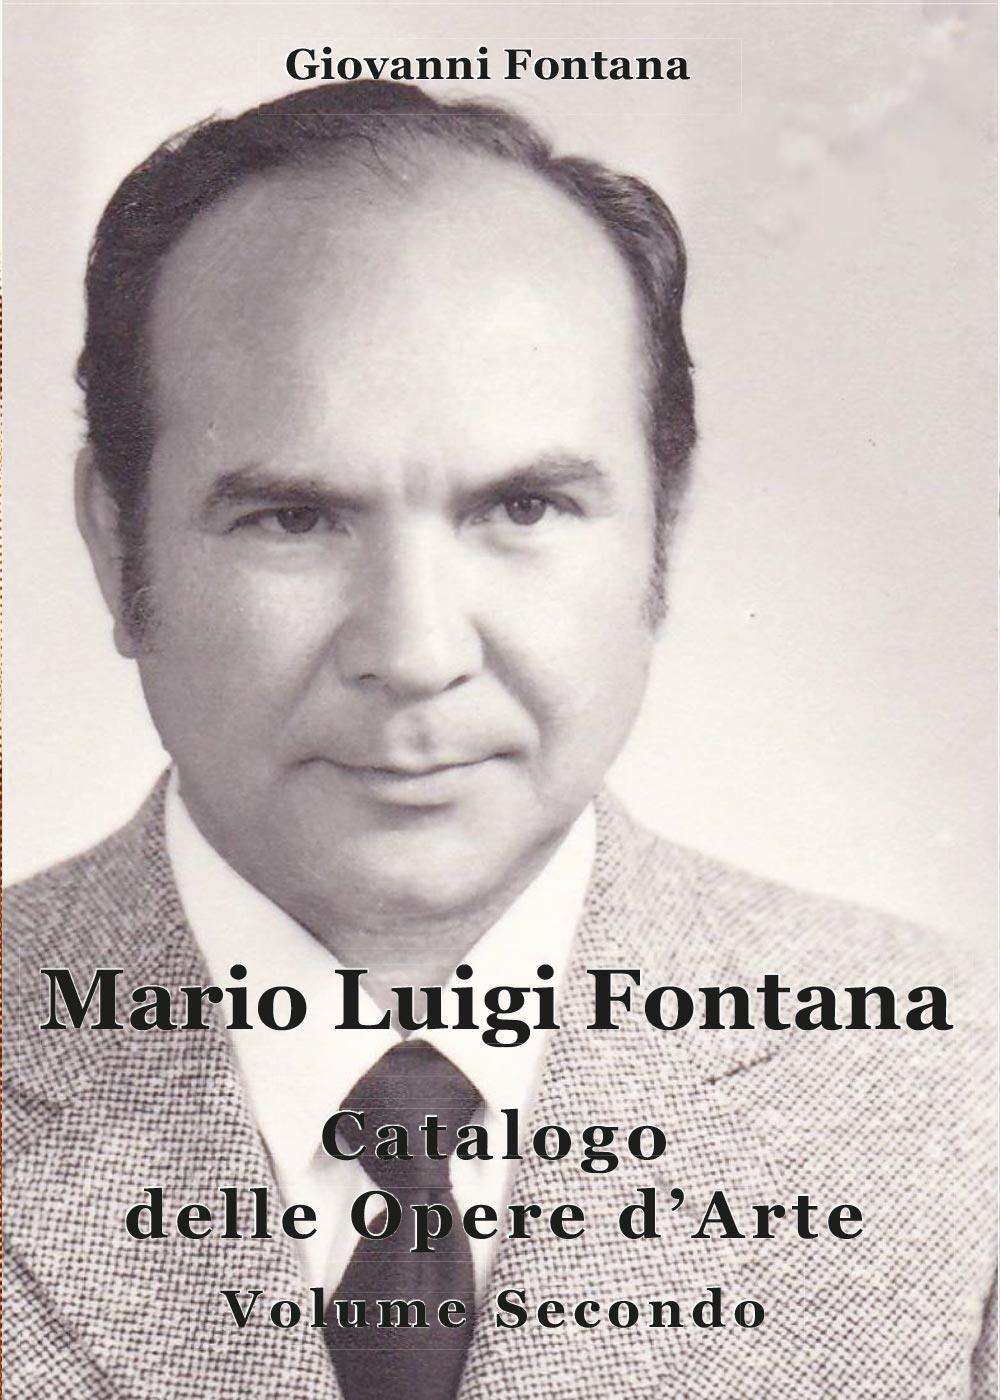 Mario Luigi Fontana. Catalogo delle opere d'arte. Volume Secondo